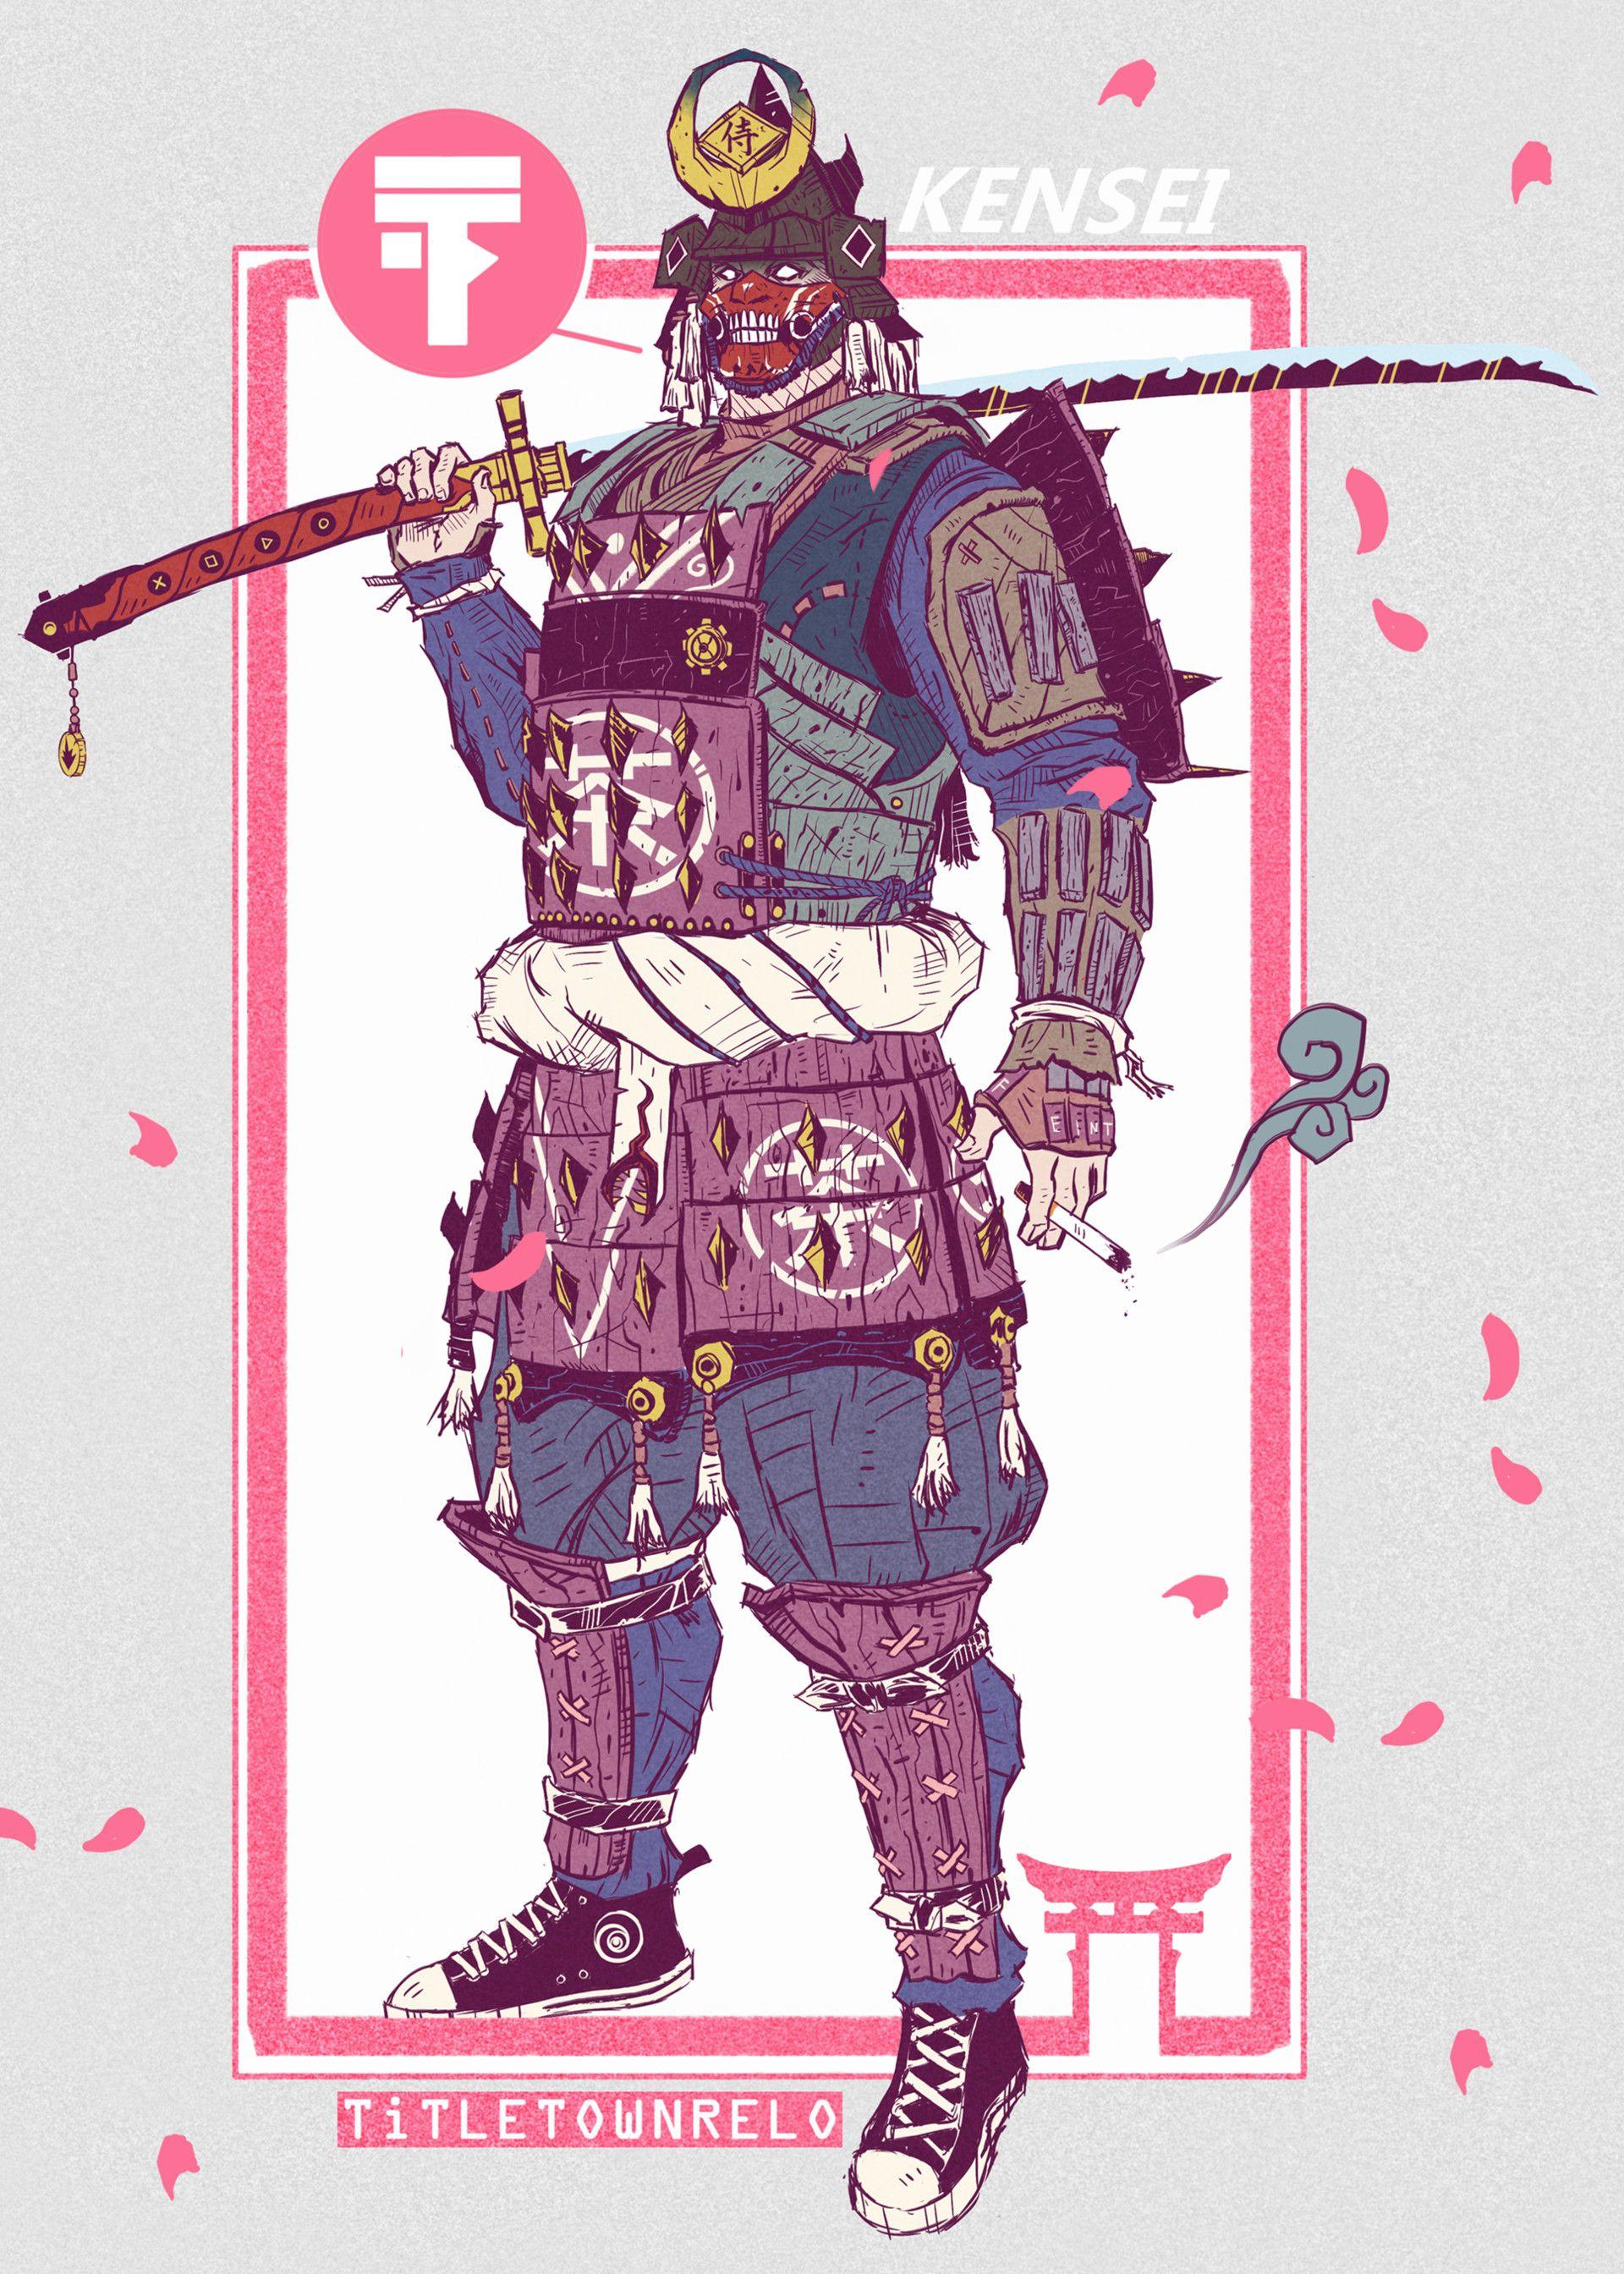 Artstation Kensei Titletownrelo Samurai Art Samurai Artwork Concept Art Characters